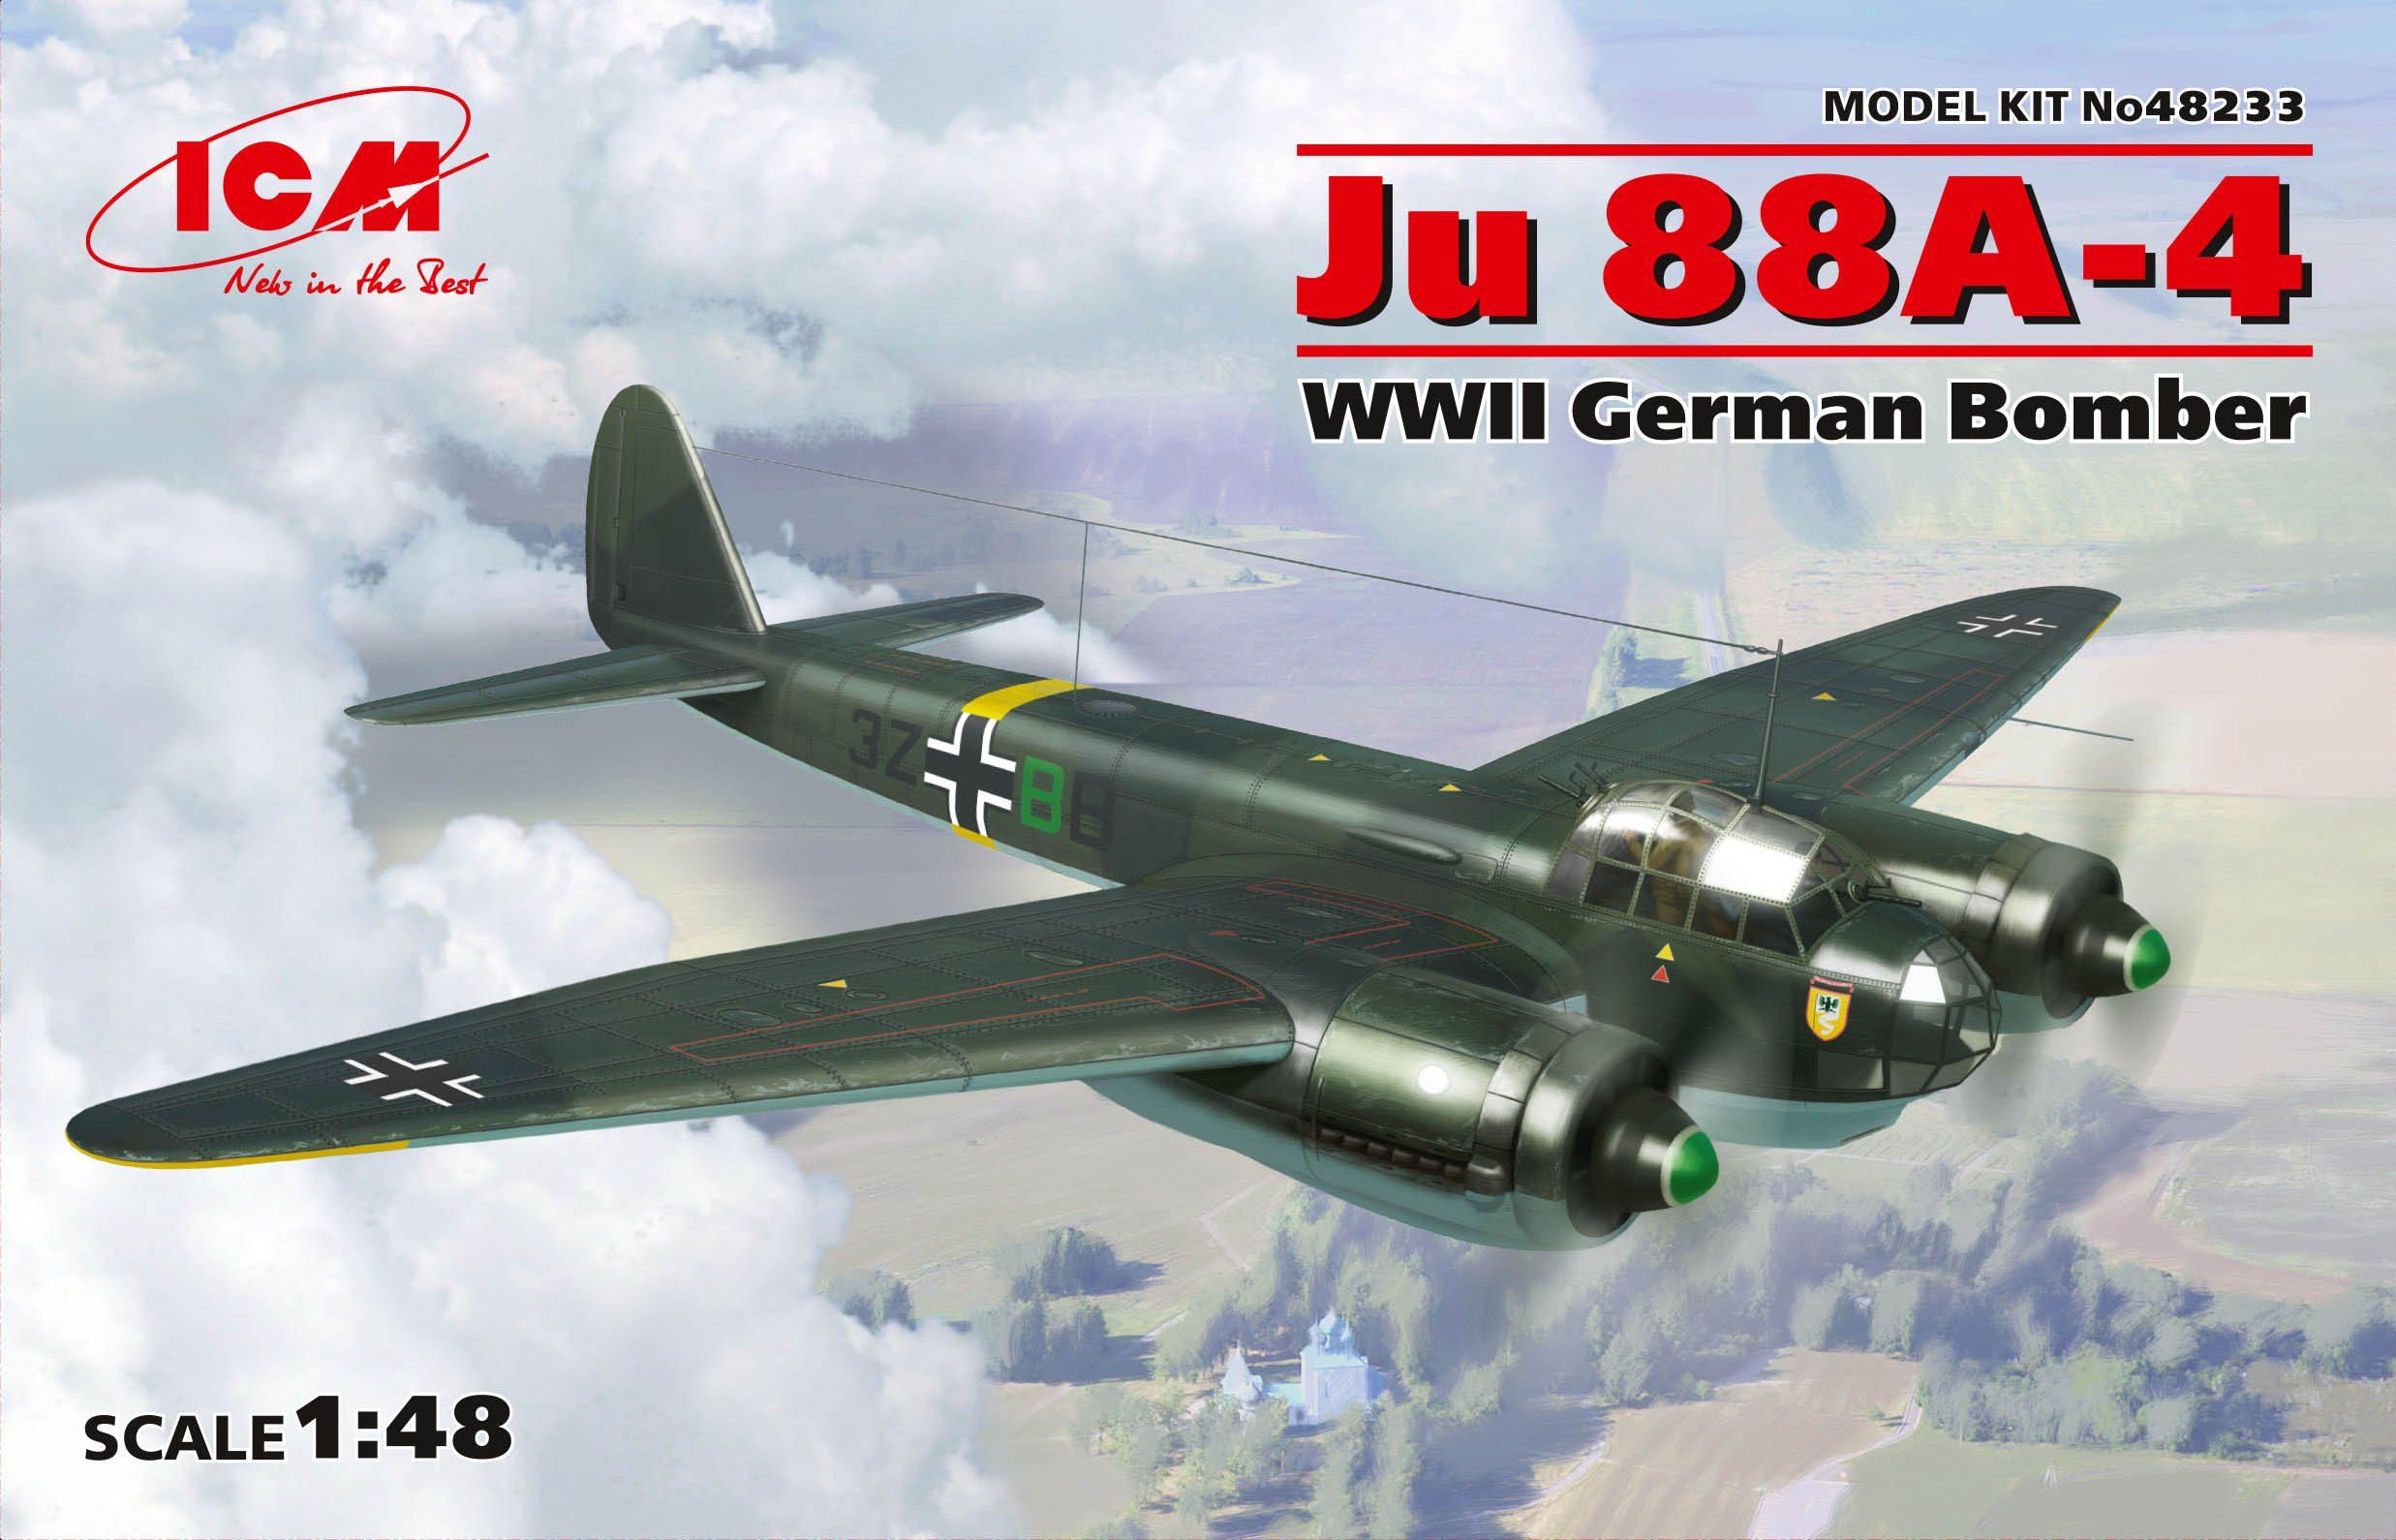 ICM Ju 88A-4, WWII German Bomber